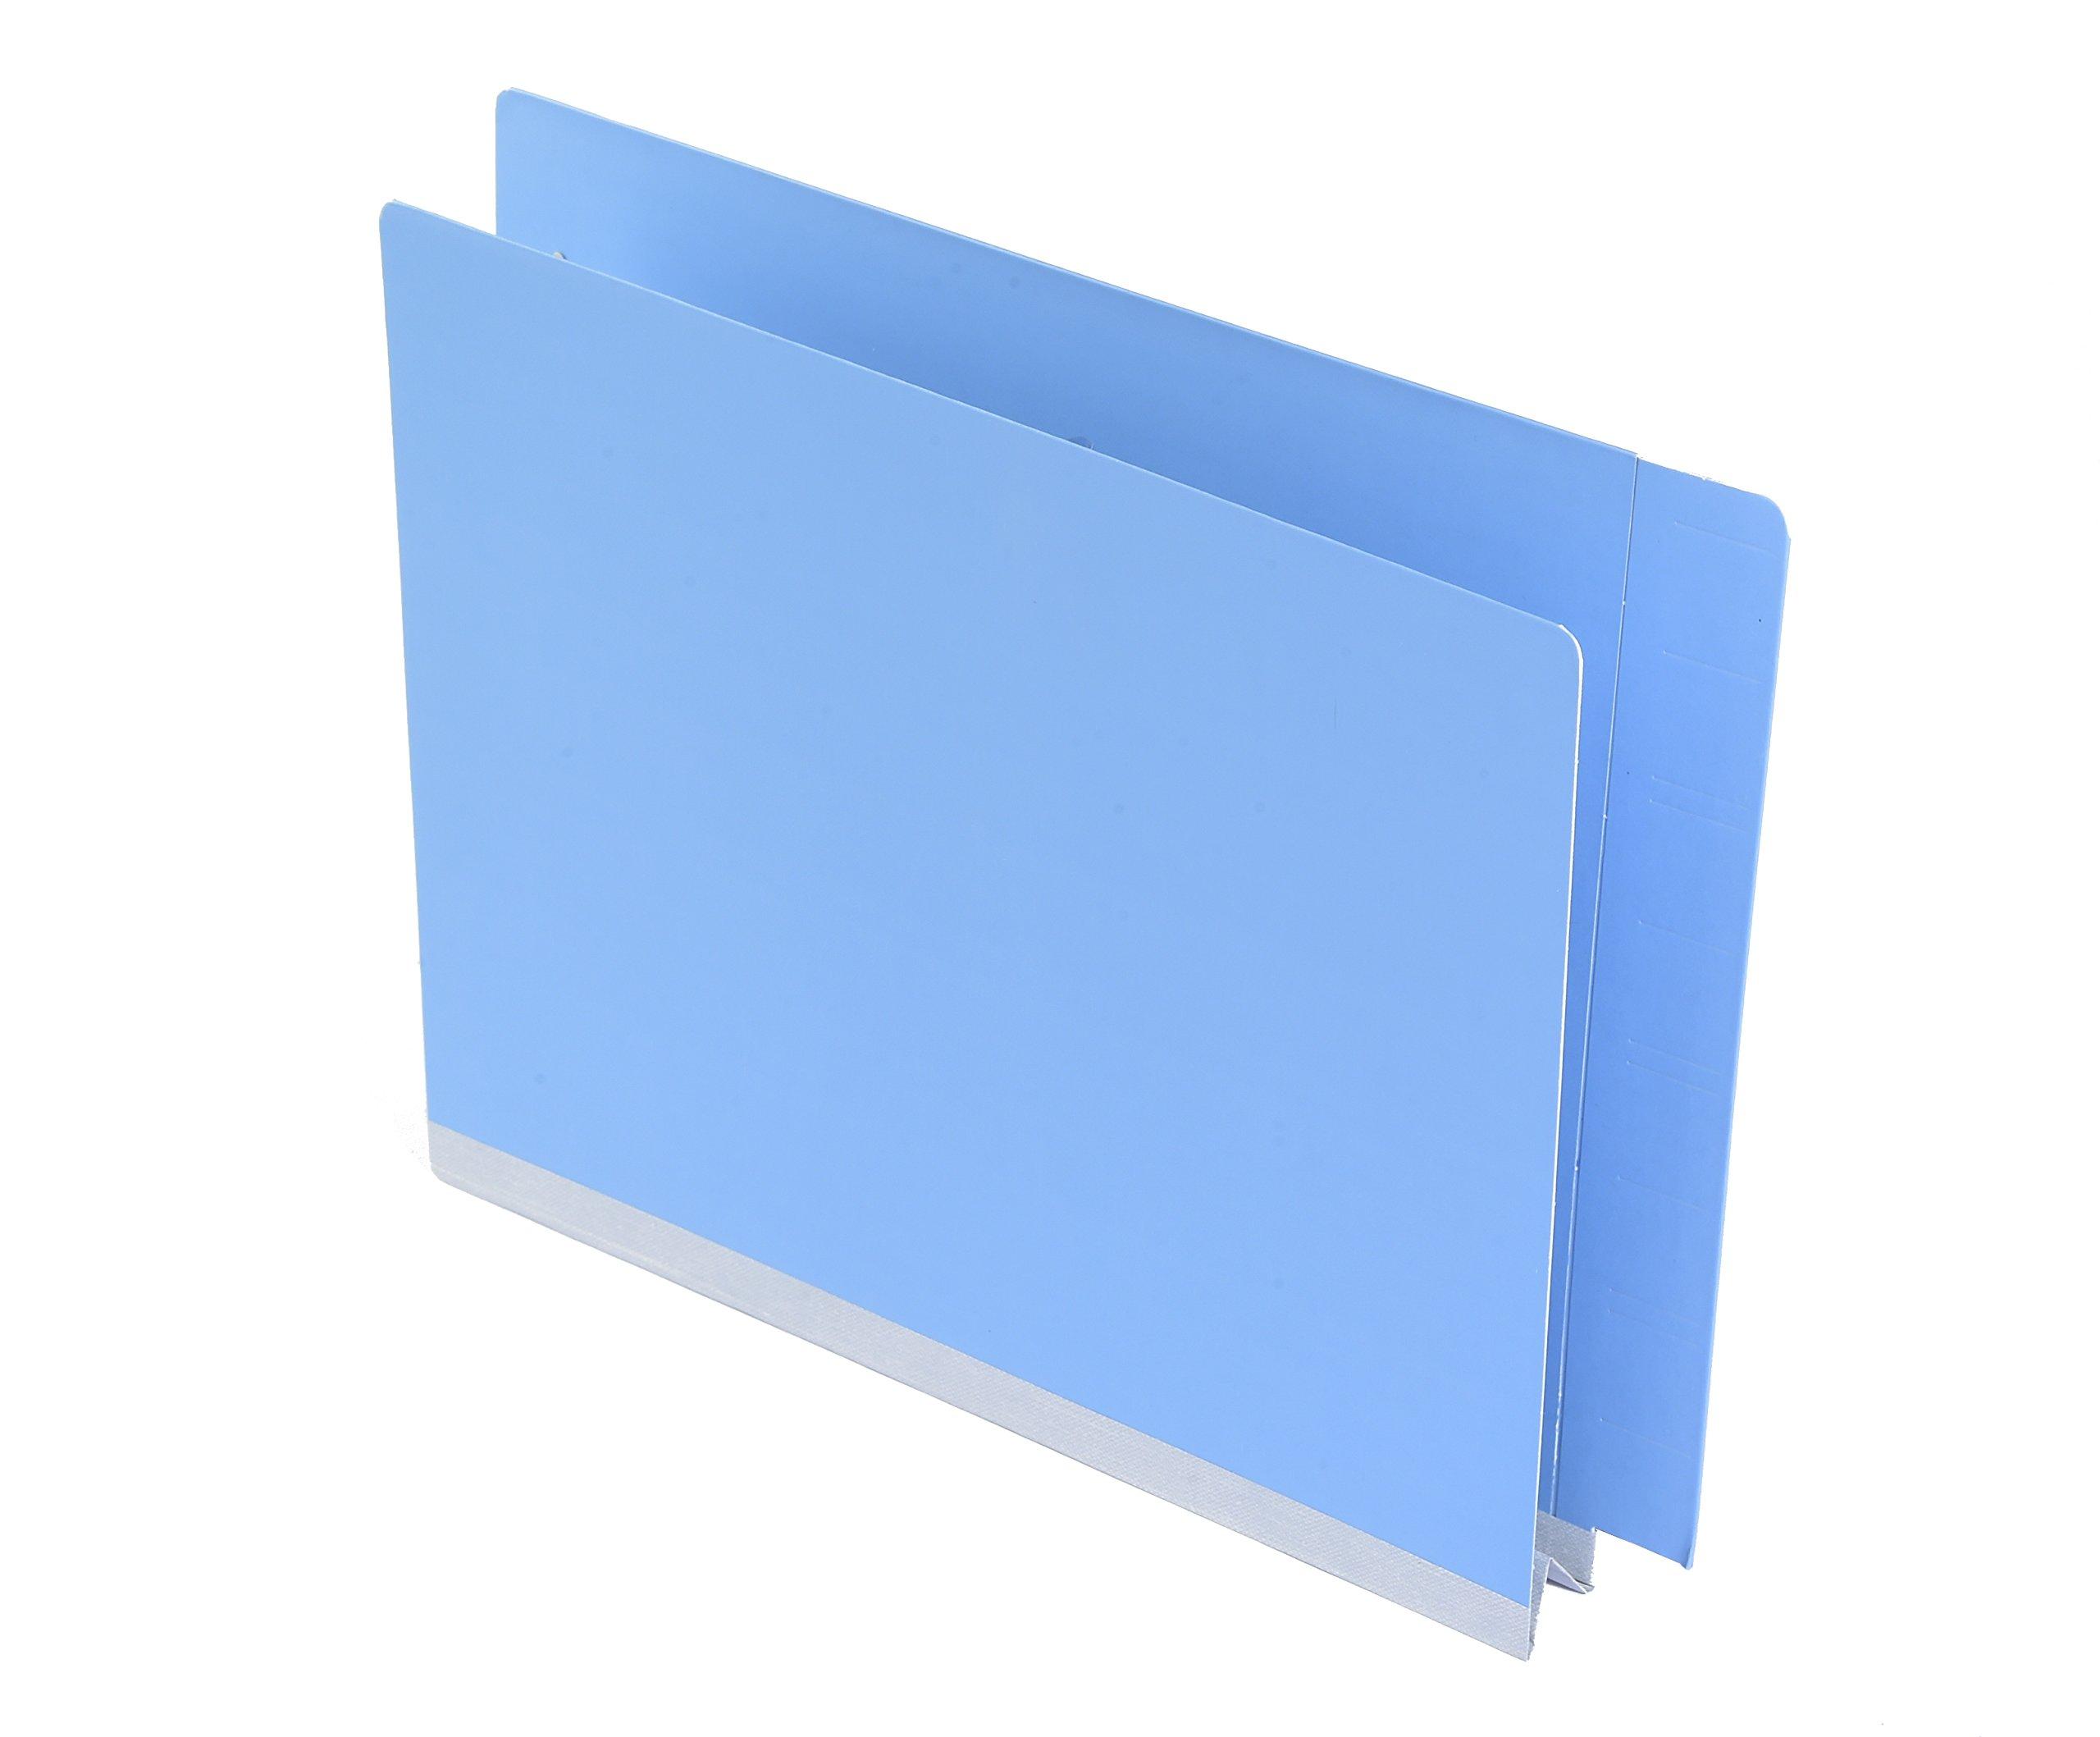 TAB FORTIfile Pressboard Expansion Folder, Azure Blue, 31 pt., 2'' Expansion, with 2 Fasteners, End Tab, Letter, 25 per Pack